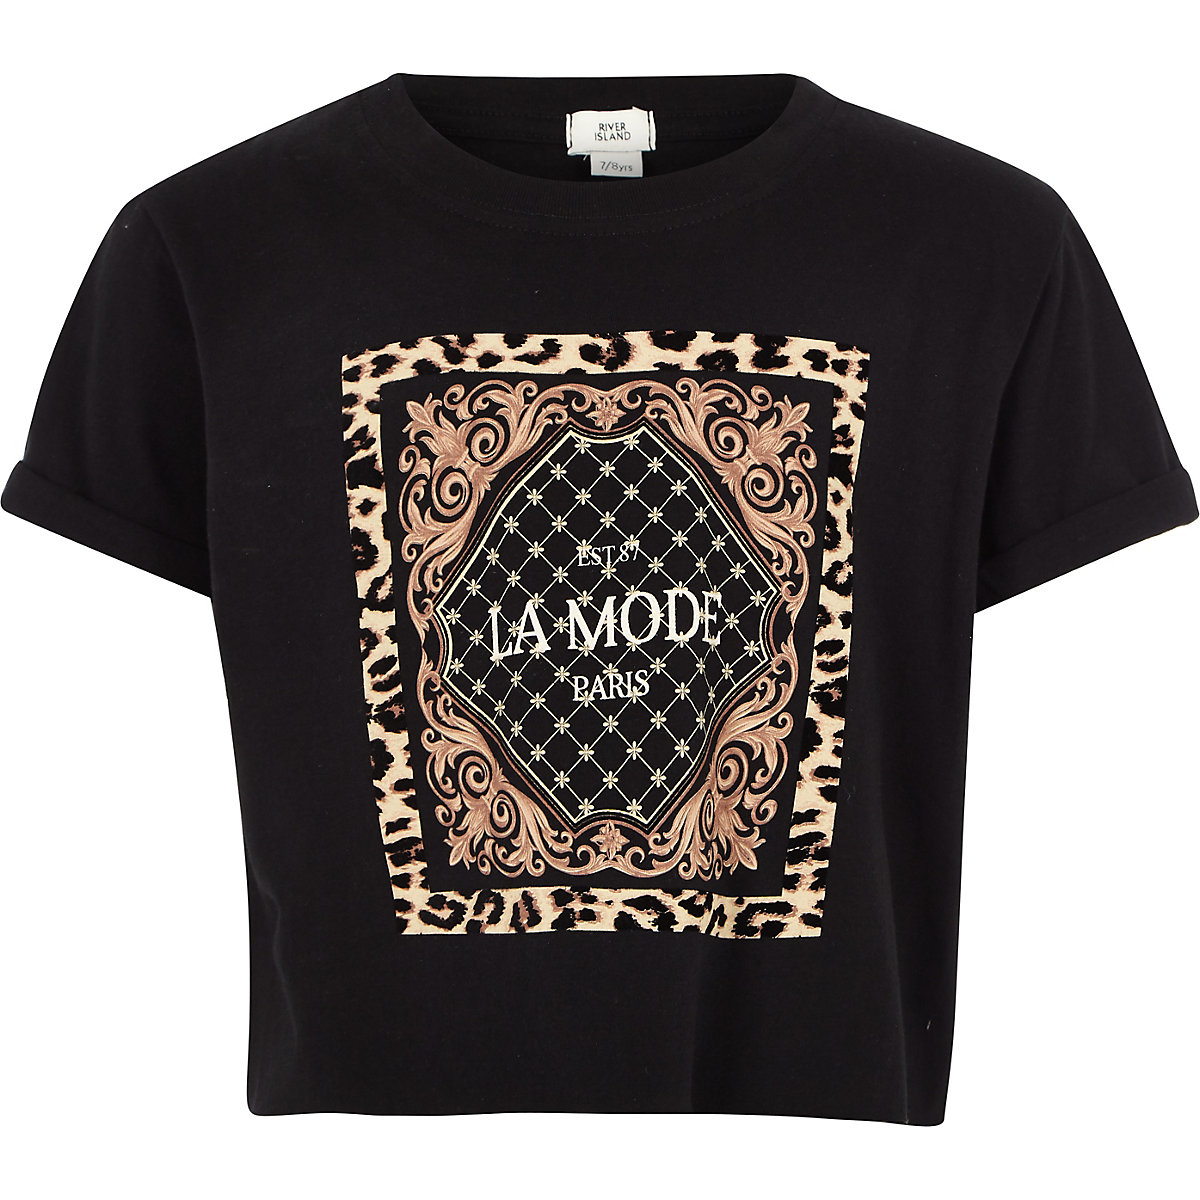 Girls black 'La mode' leopard print T-shirt